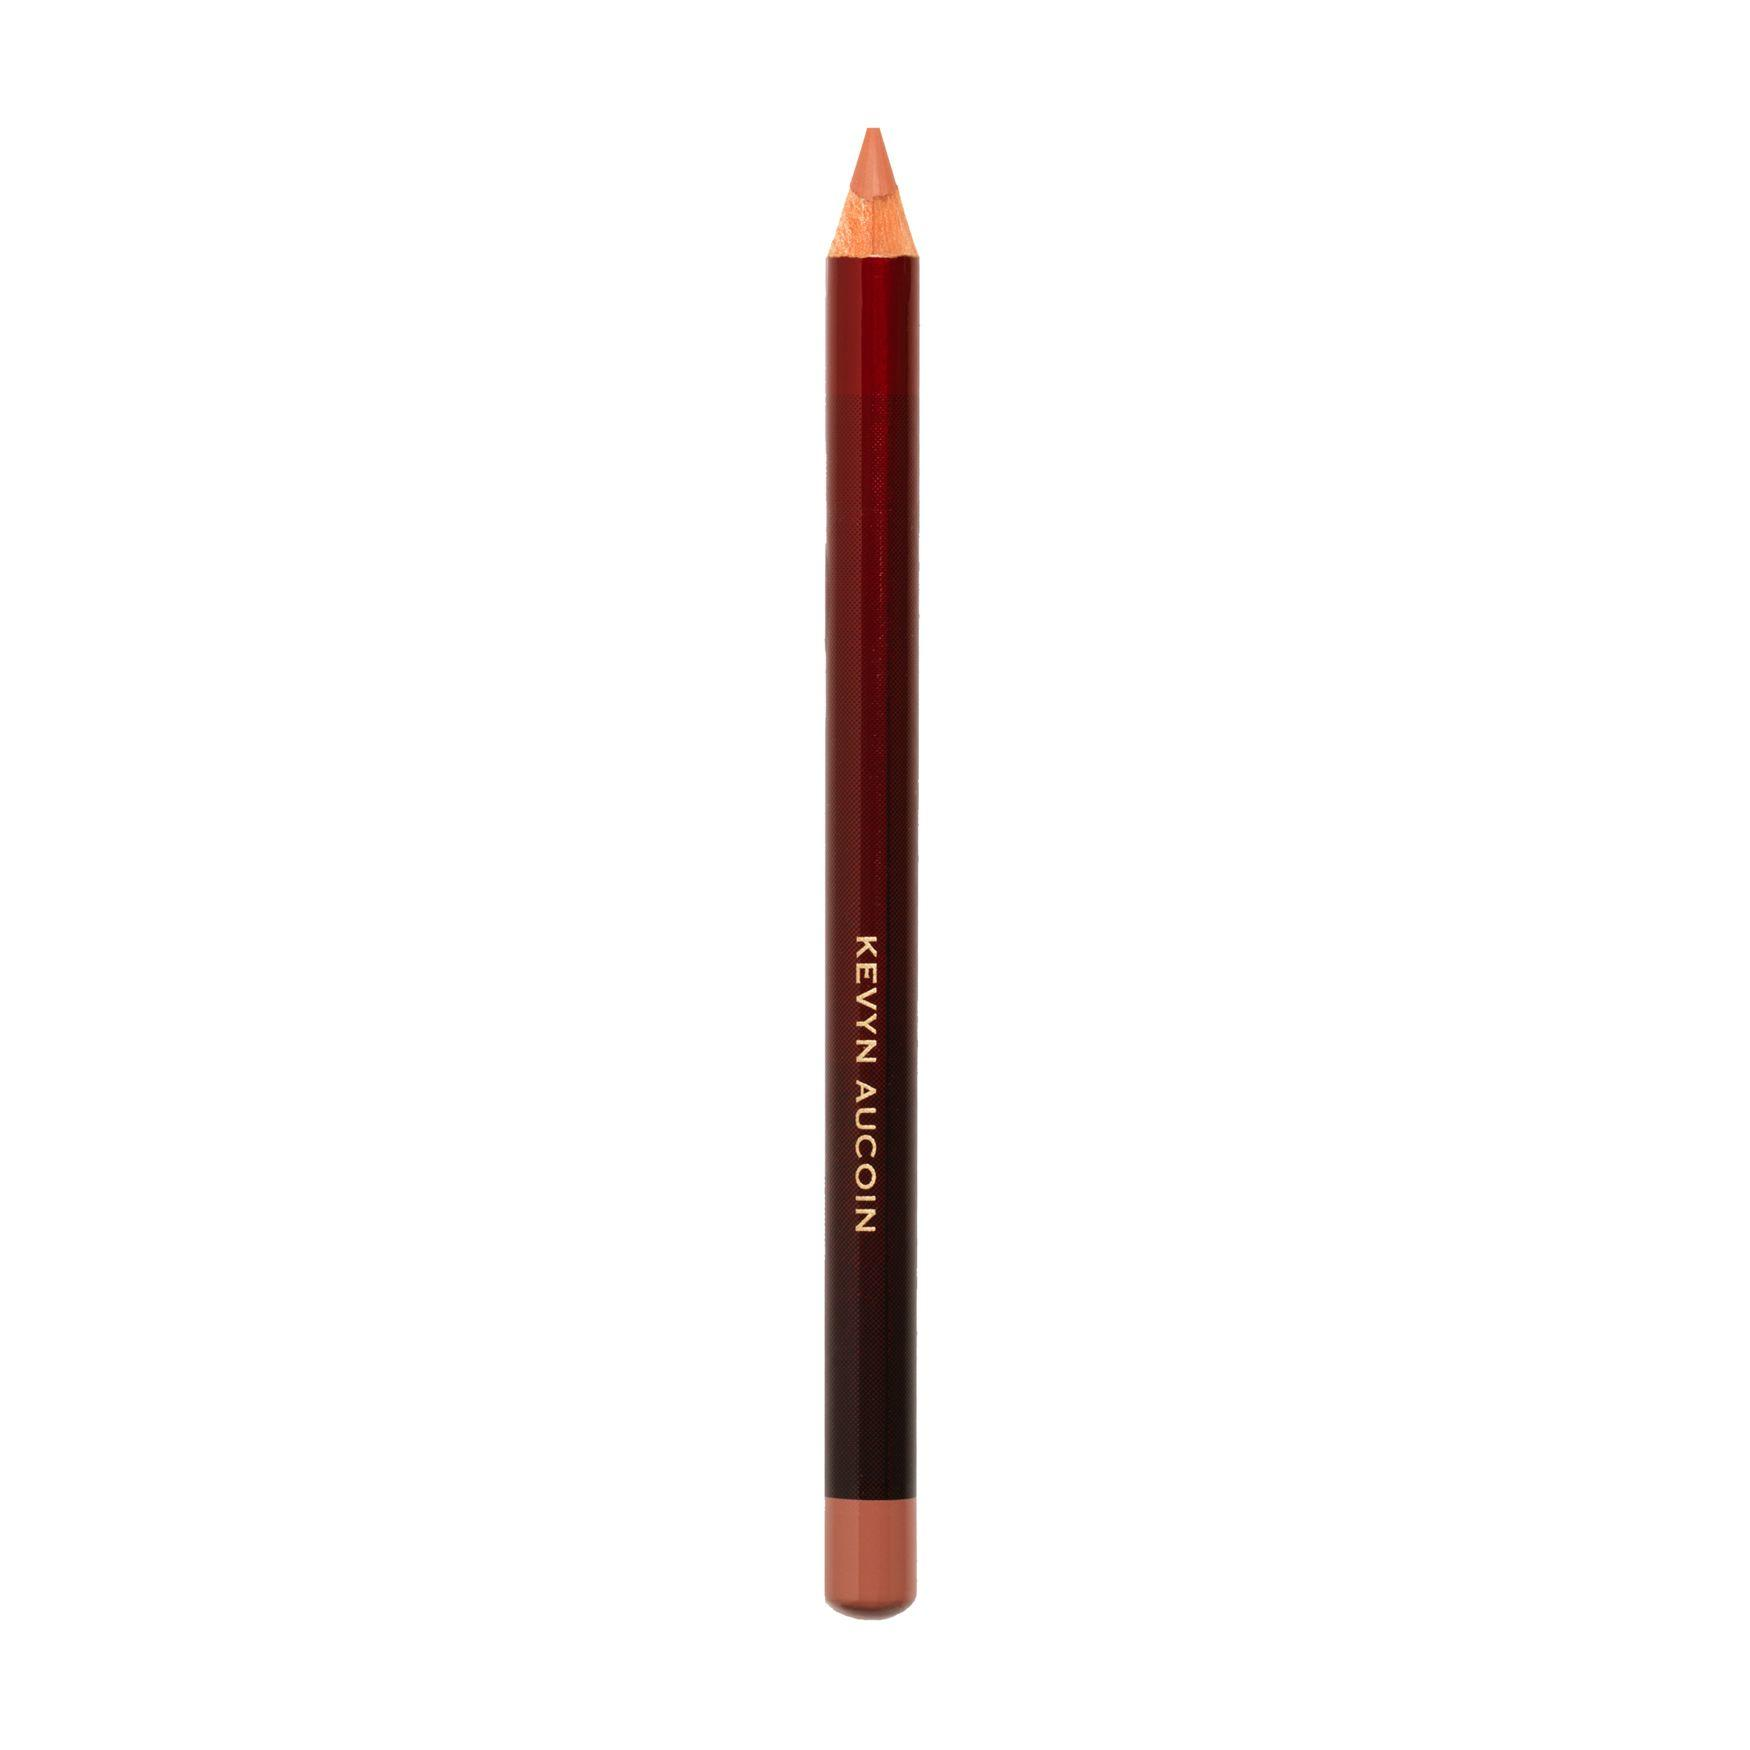 Kevyn Aucoin The Flesh Tone Lip Pencil Cerise